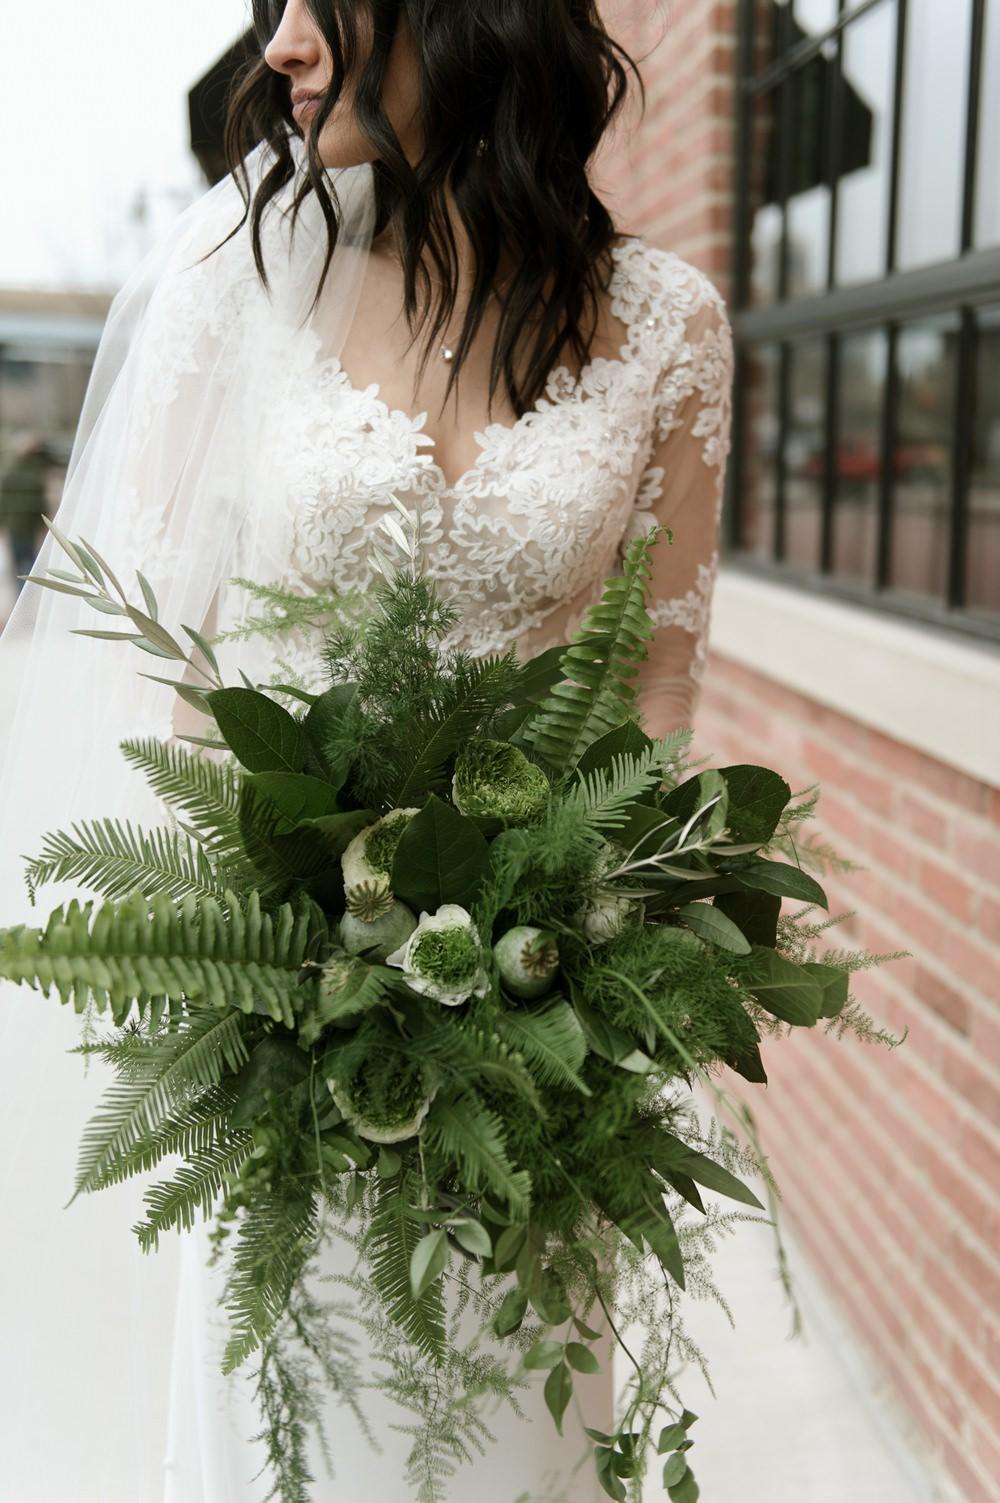 Bouquet Flowers Bride Bridal Greenery Foliage Botanical Fern Greenhouse Michigan Wedding Jean Smith Photography